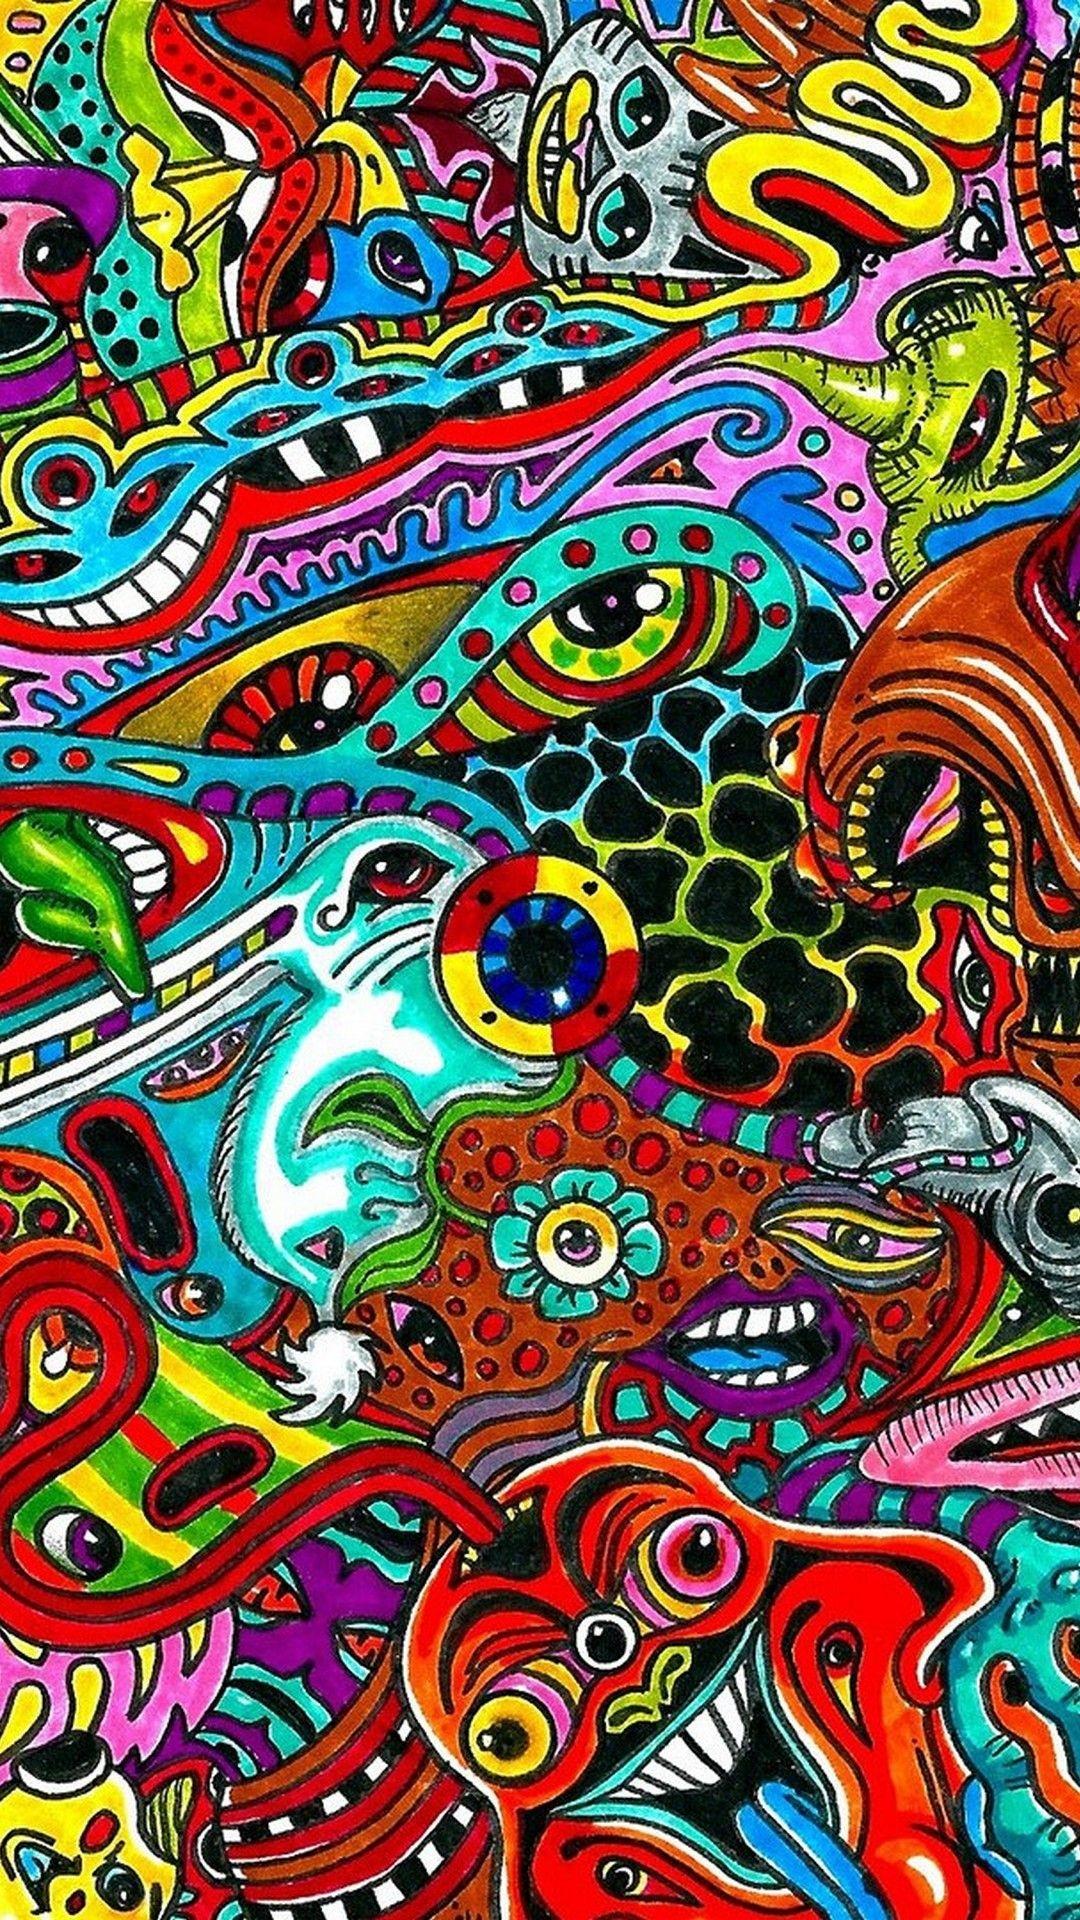 Res: 1080x1920, iPhone 7 Wallpaper Psychedelic - Best iPhone Wallpaper